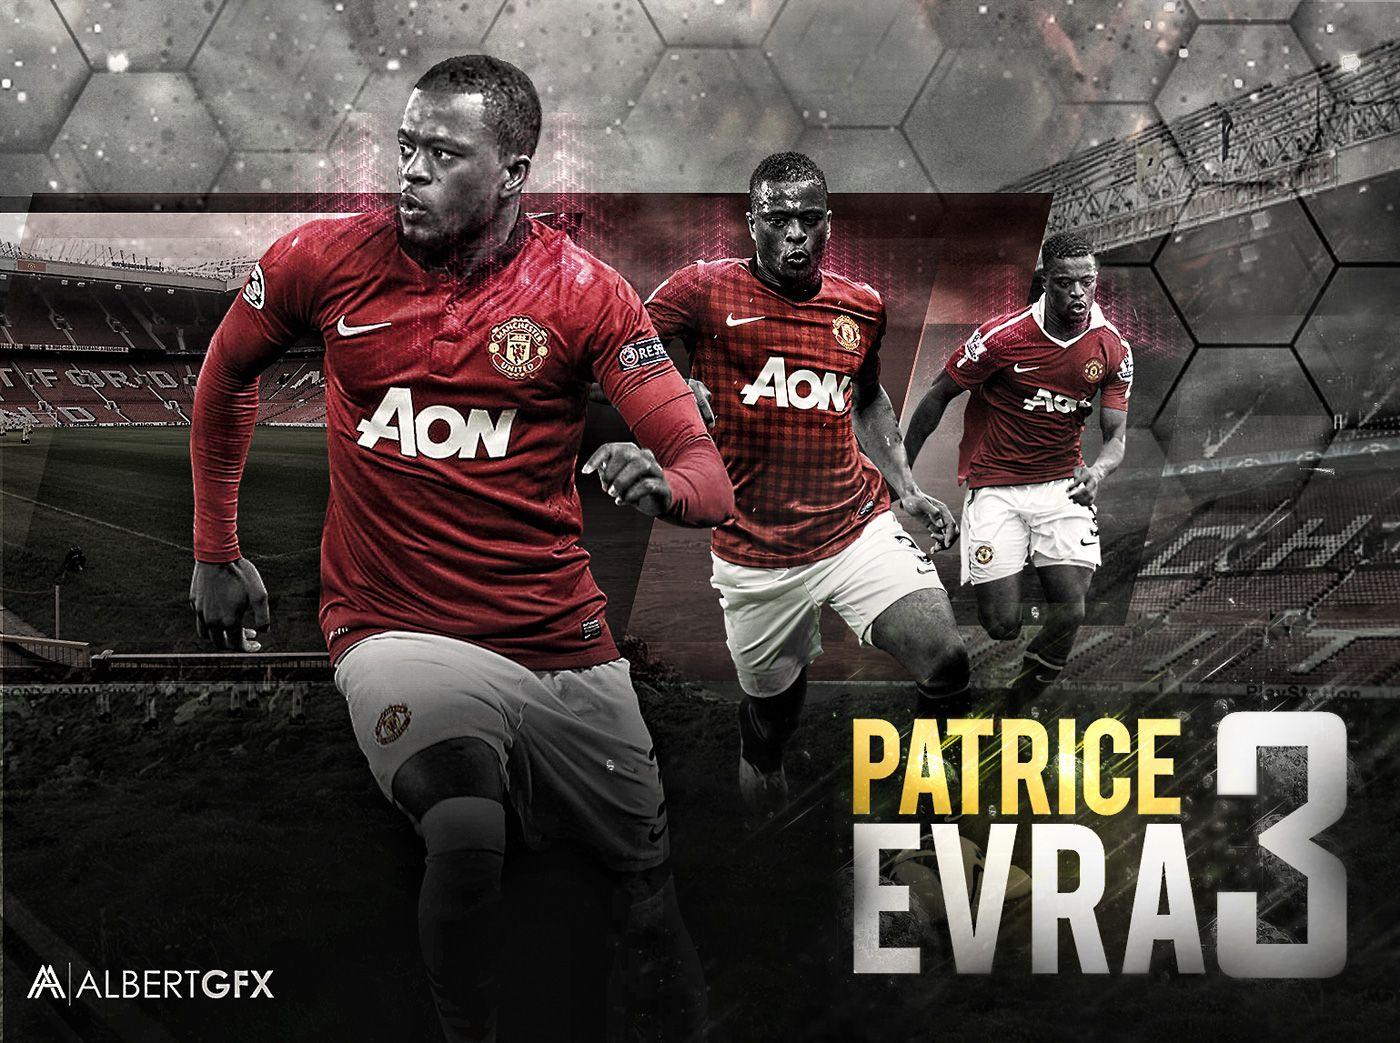 Patrice Evra